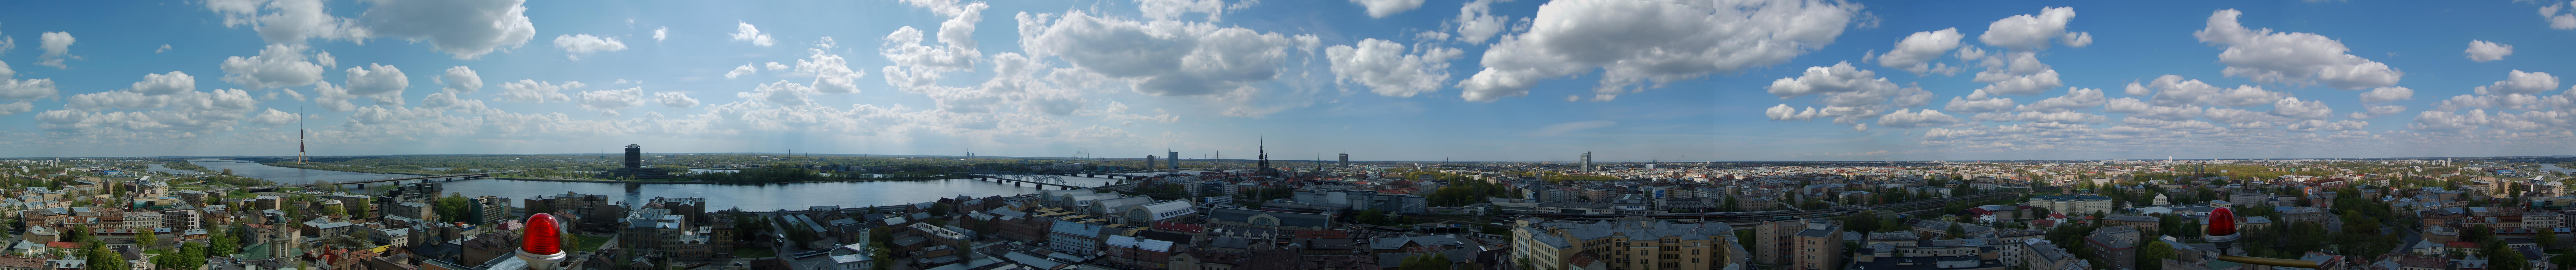 Панорама Риги со здания Латвийской академии наук